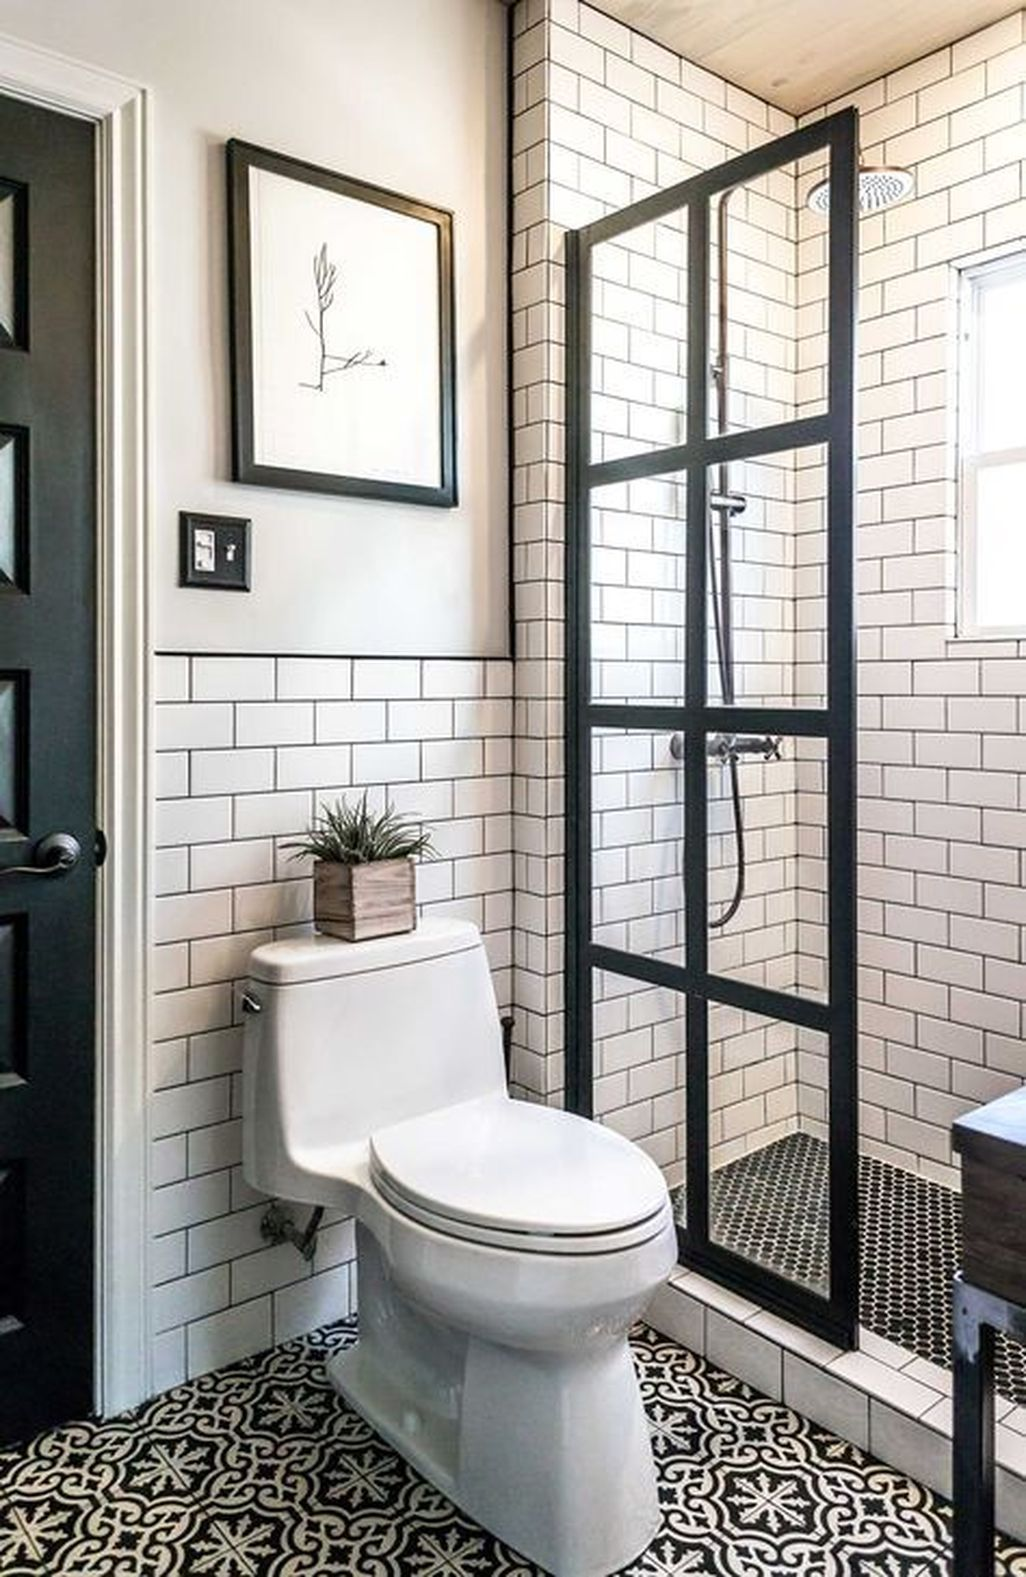 47 stunning small bathroom remodel inspiration ideas with on stunning small bathroom design ideas id=97141